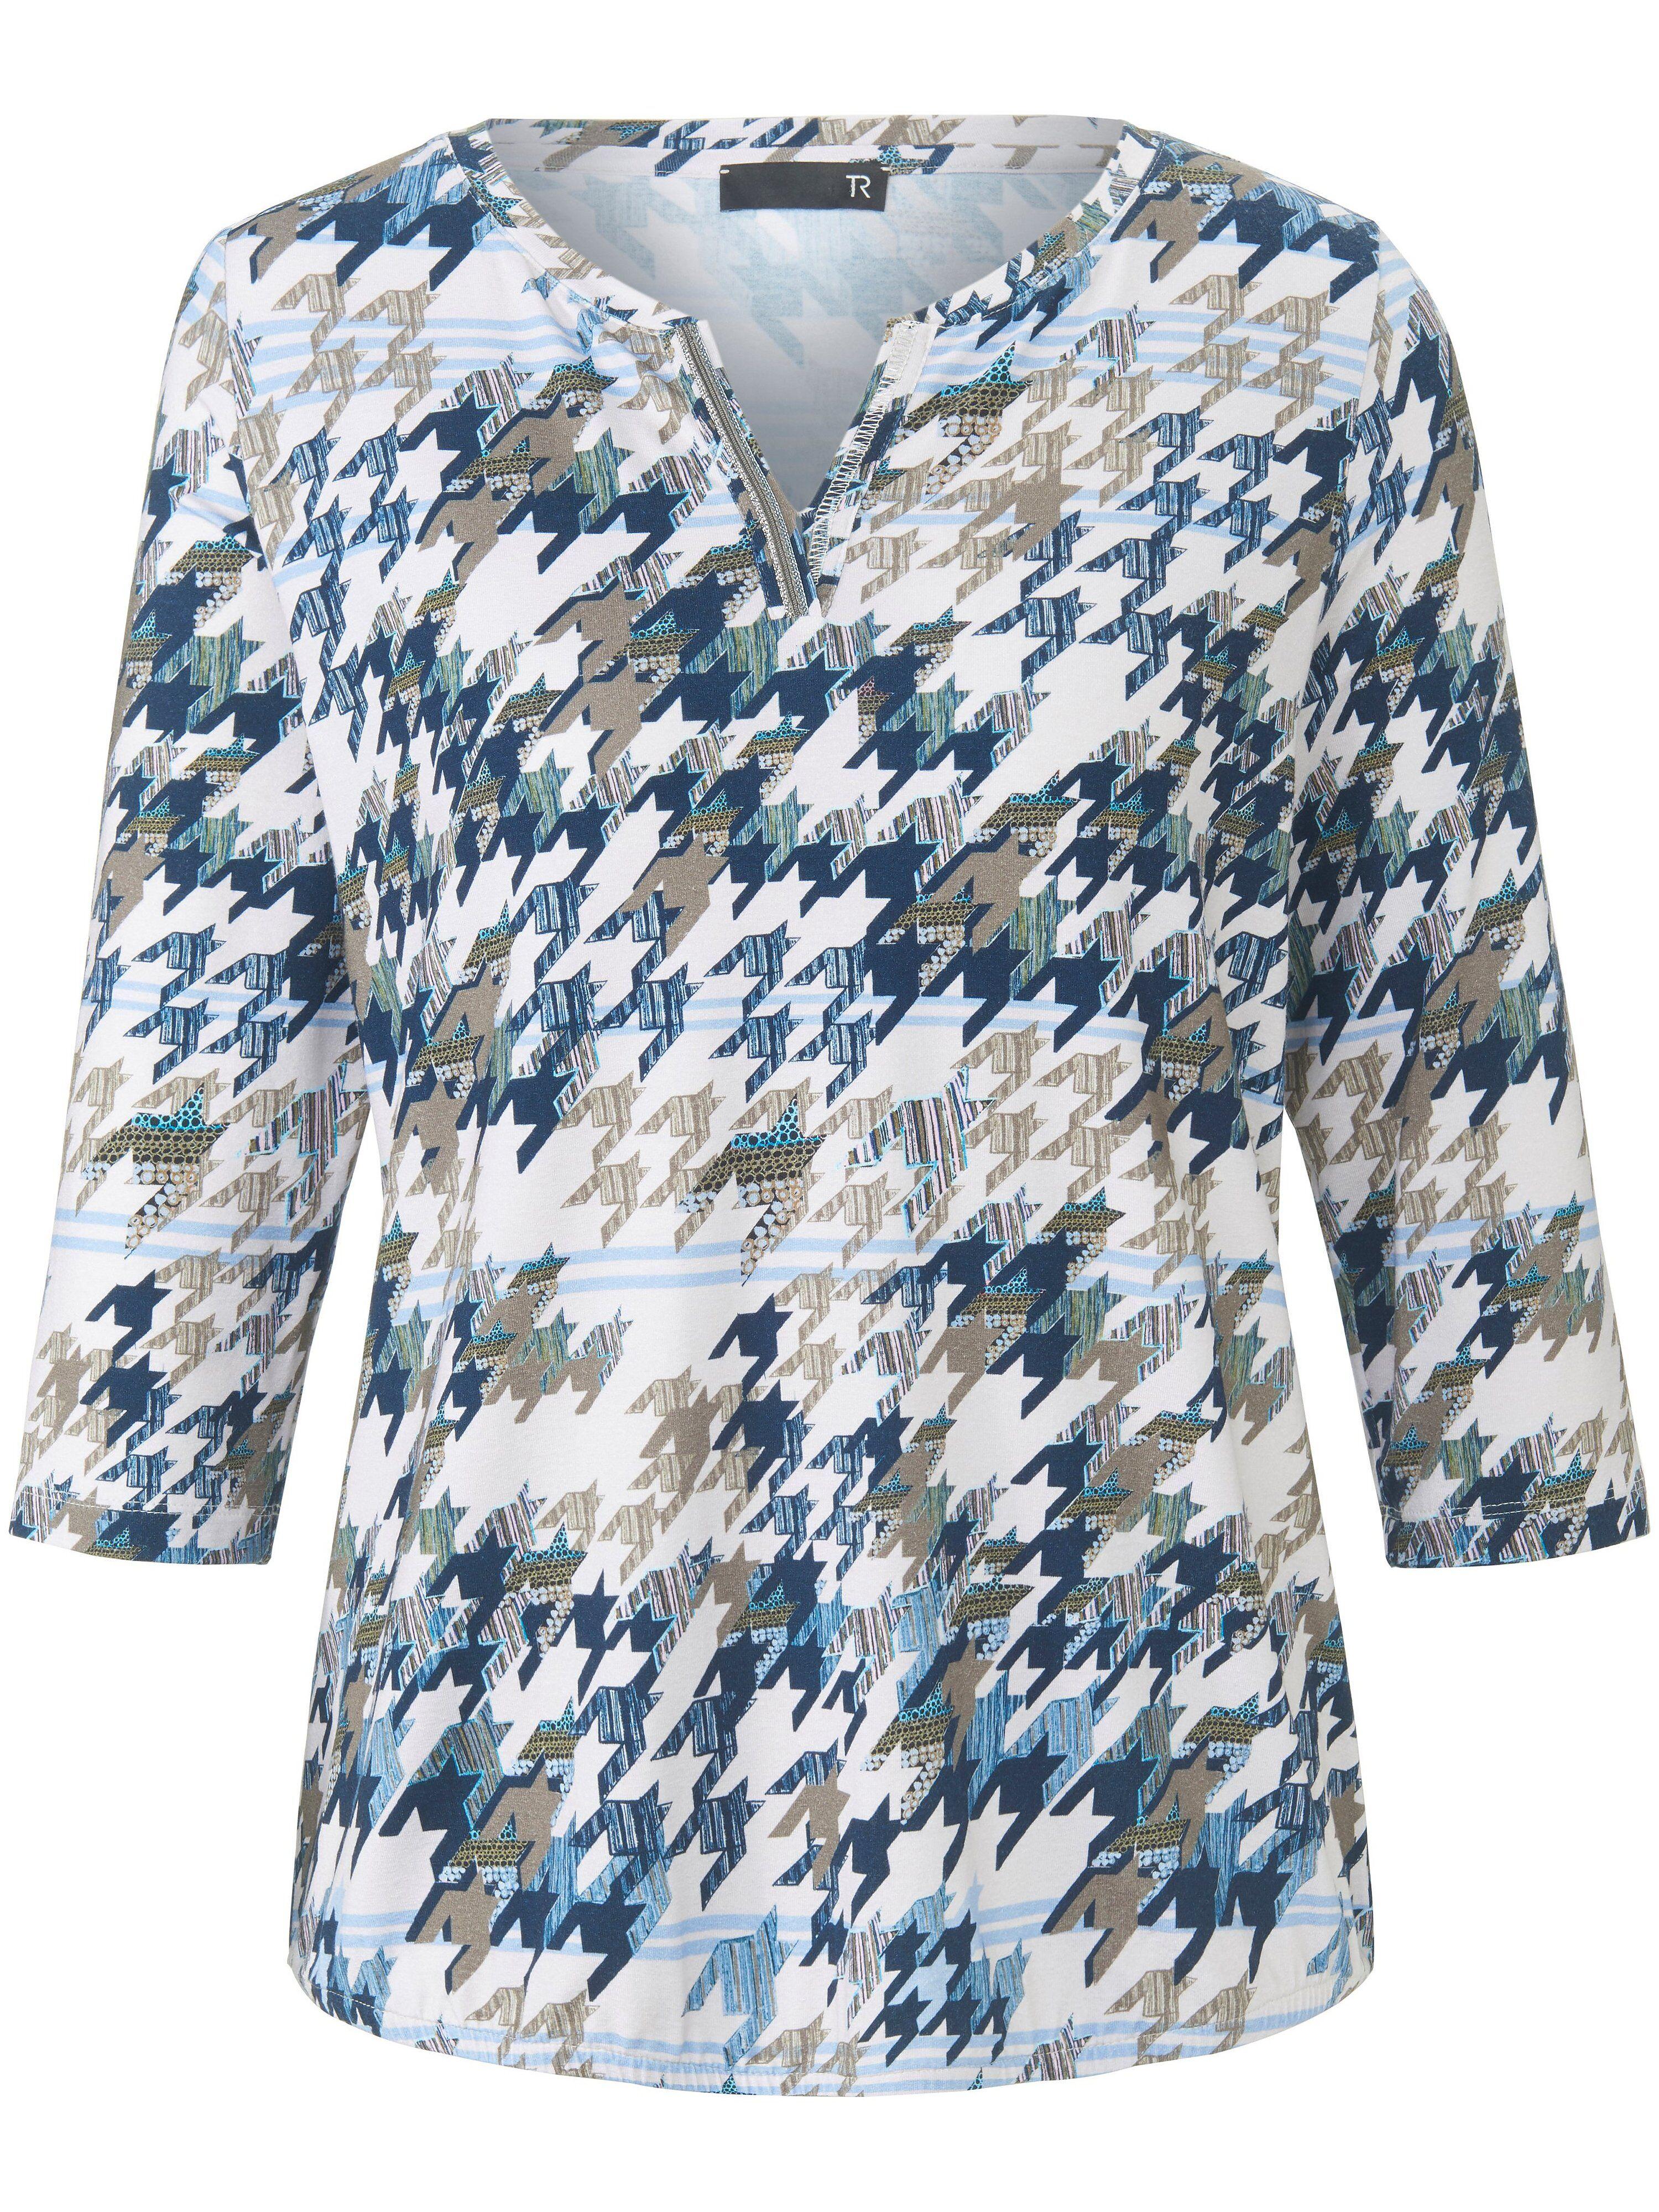 Rabe Le T-shirt manches 3/4  Rabe bleu  - Femme - 38